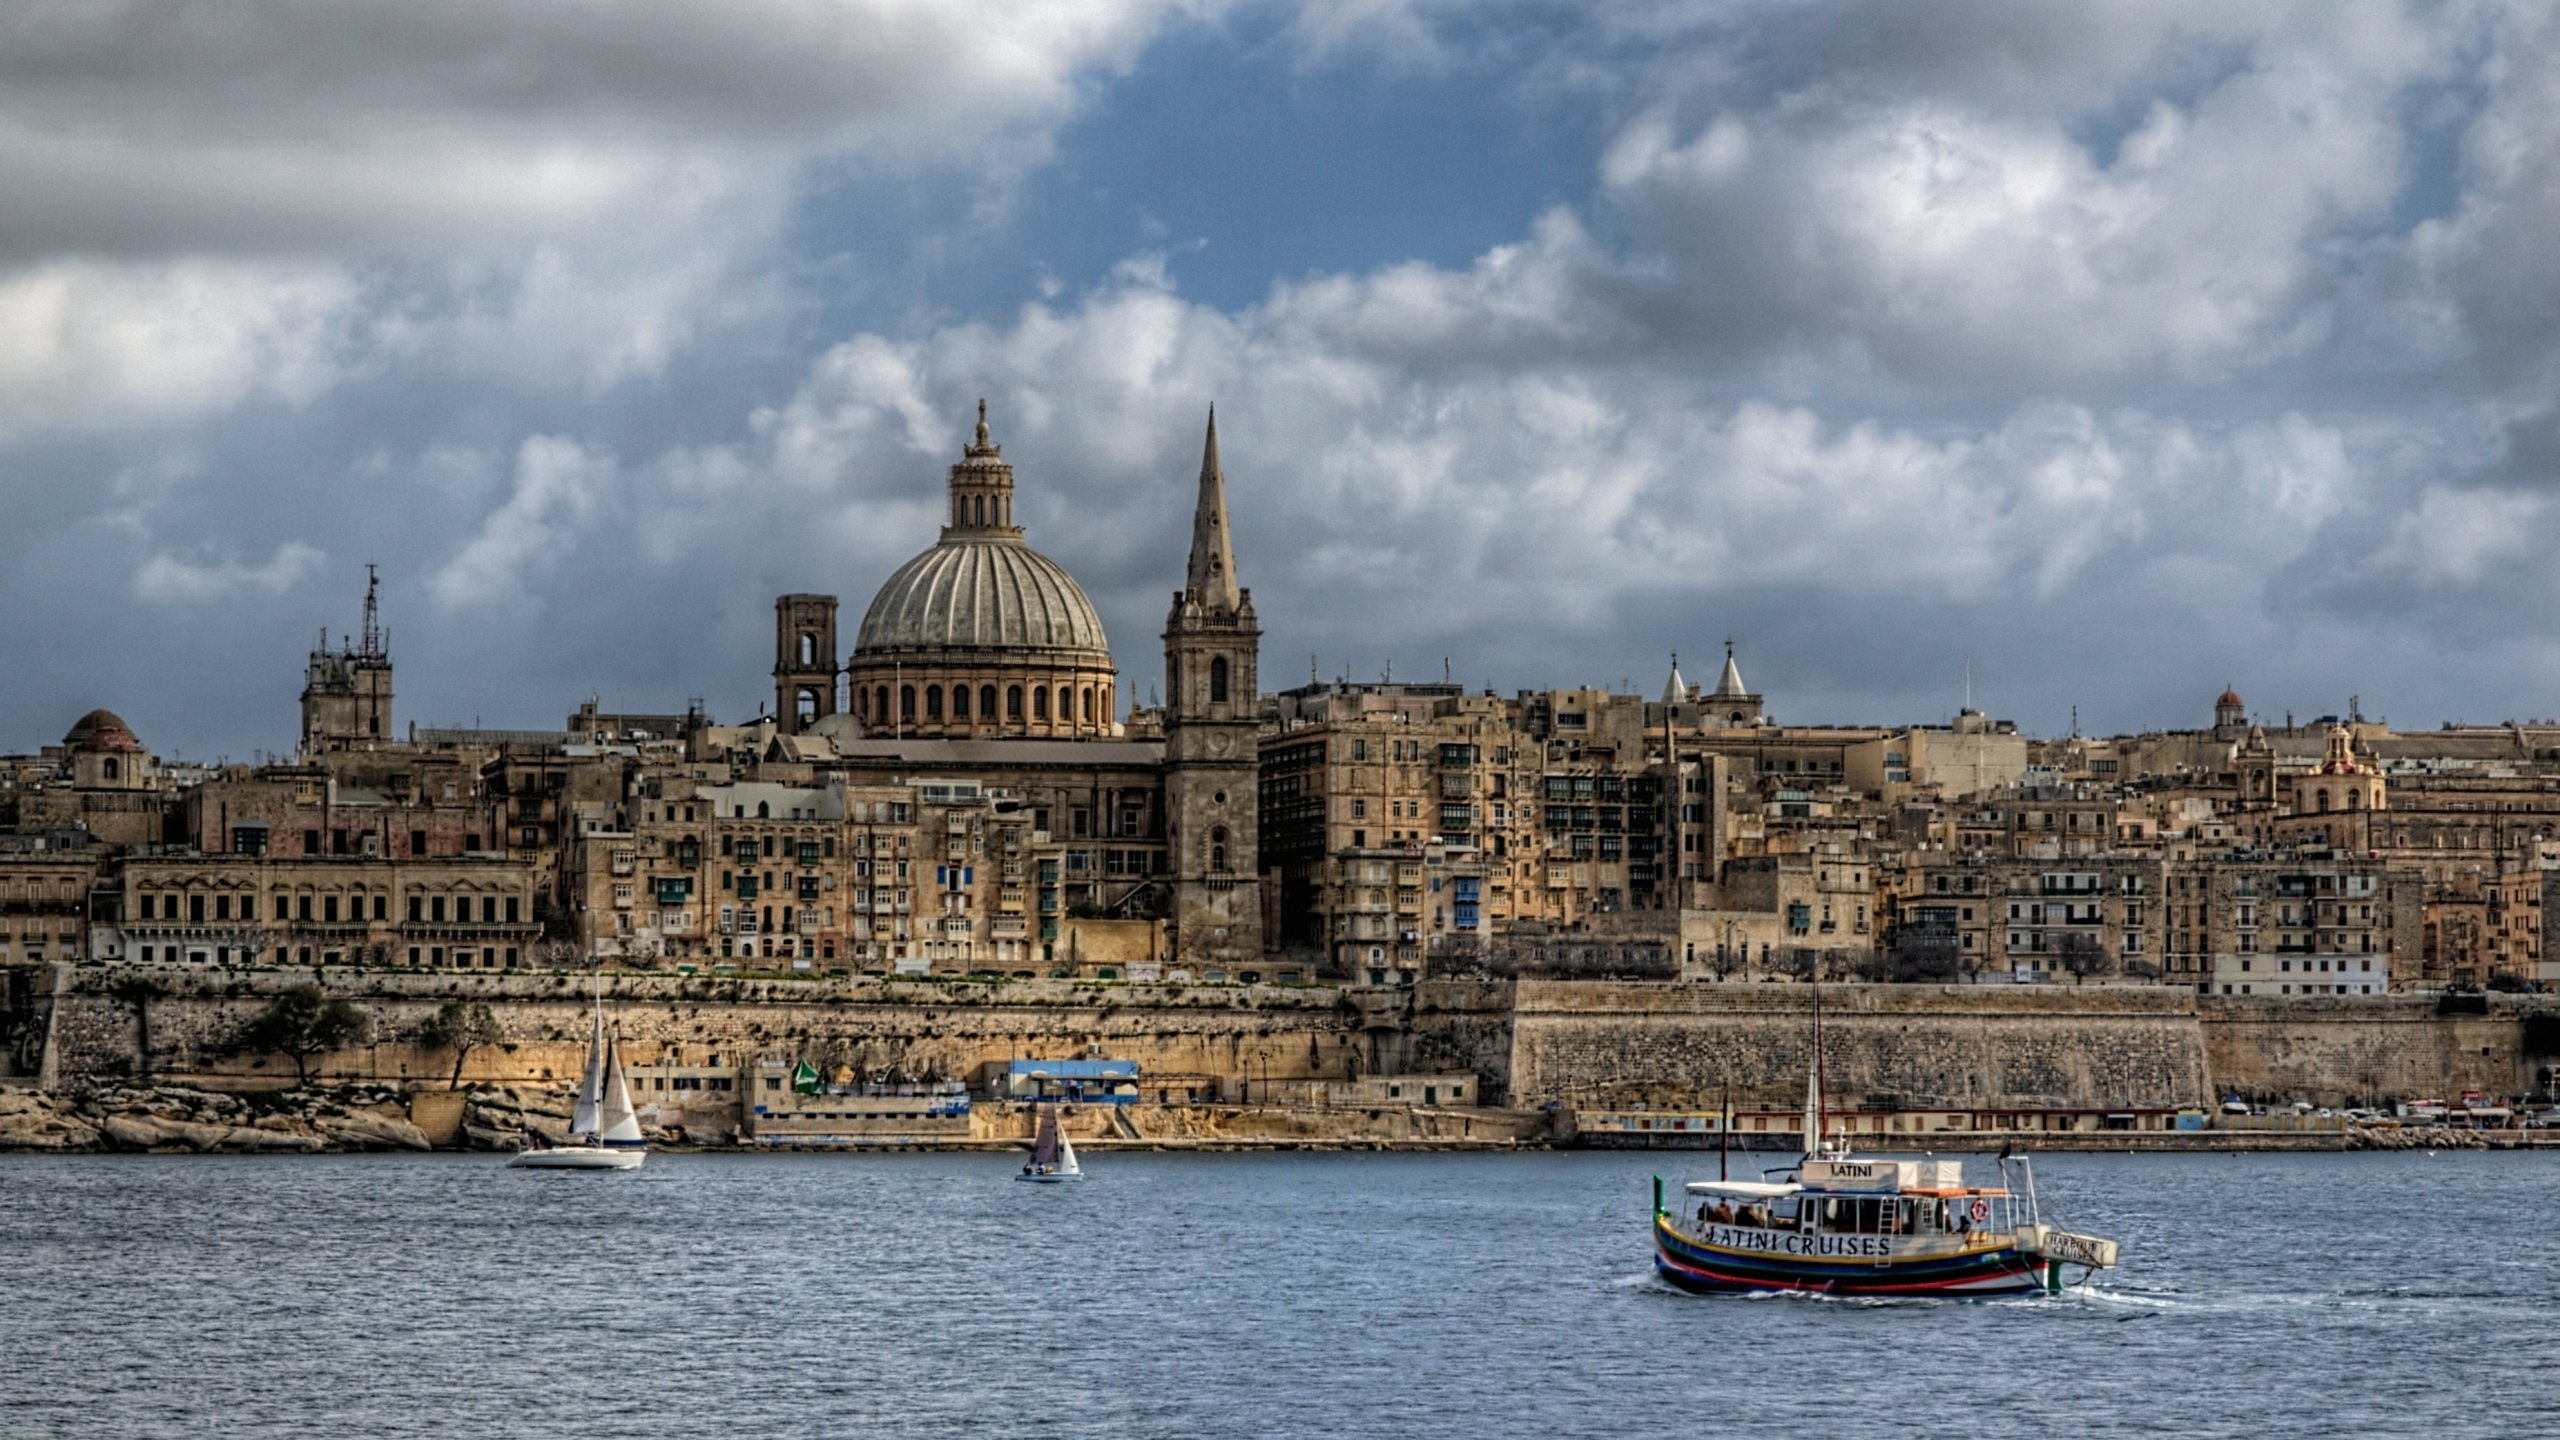 Malta Wallpapers Hd For Desktop Backgrounds Images, Photos, Reviews